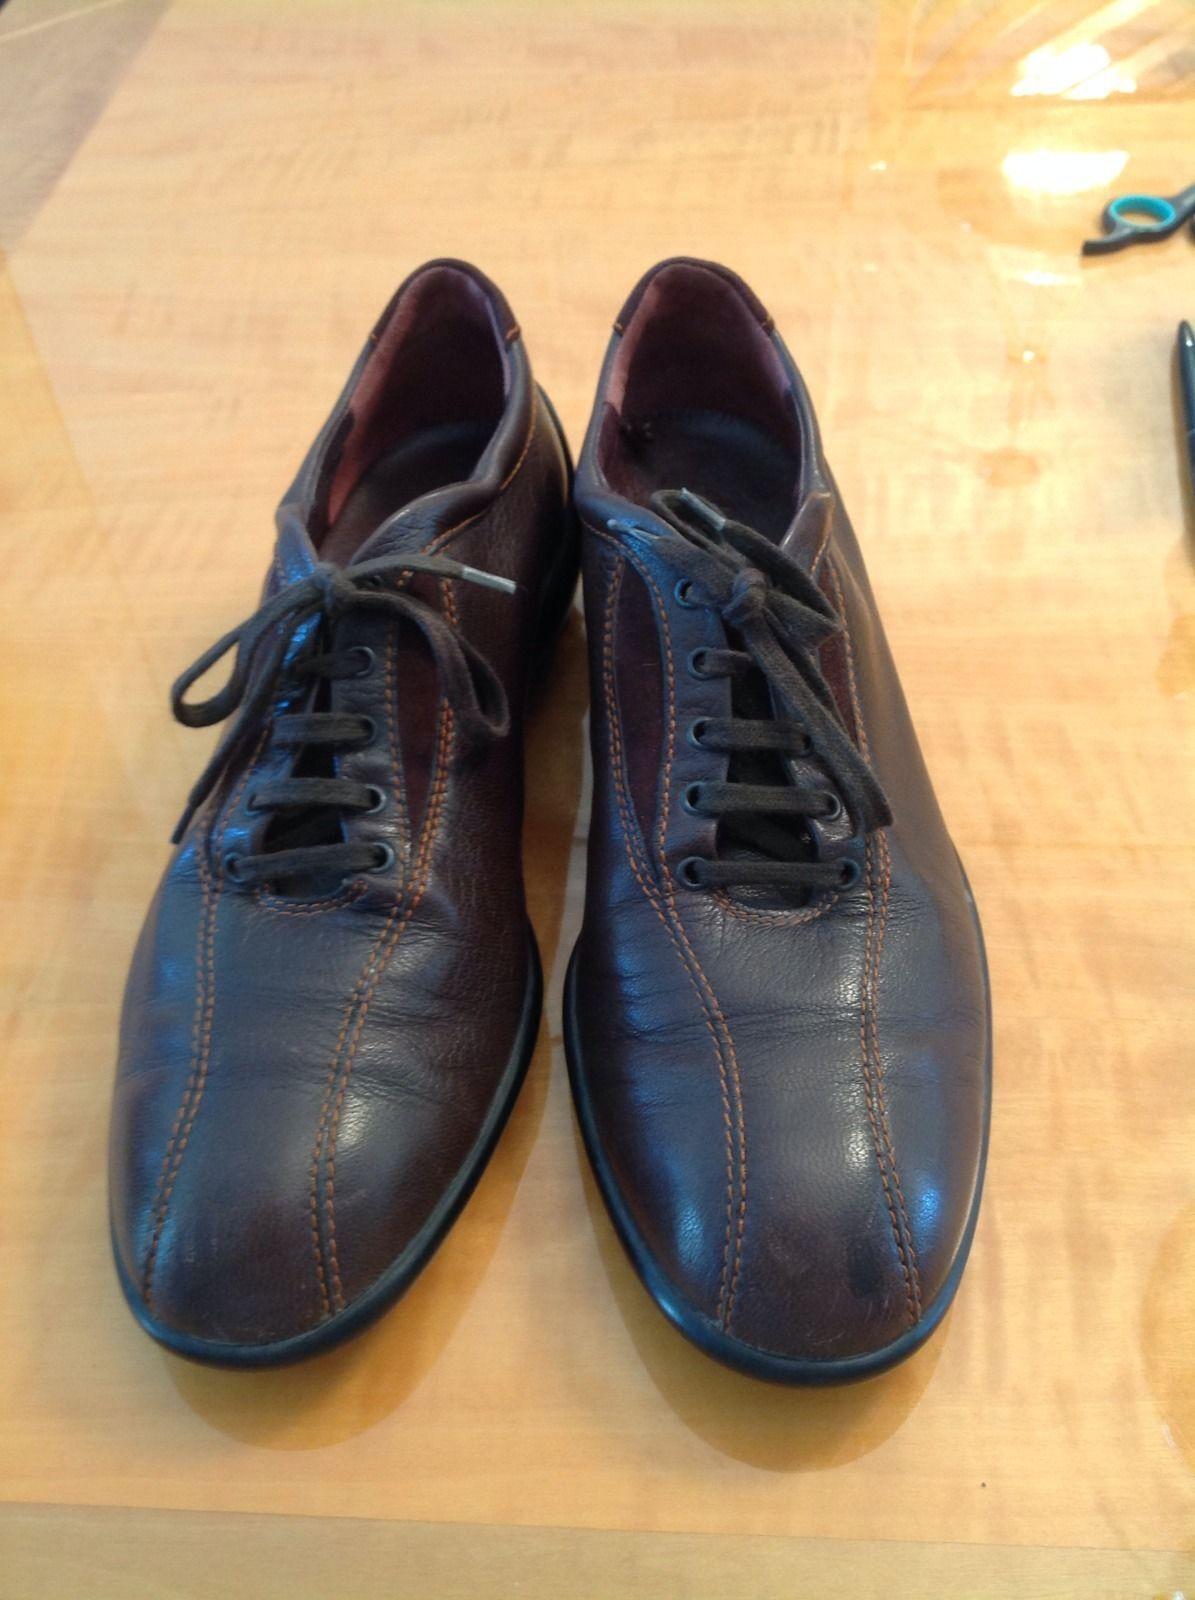 EUC HOGAN Braun Soles Leder Sneakers w/ Rubber Soles Braun SZ 38.5 d39ee2